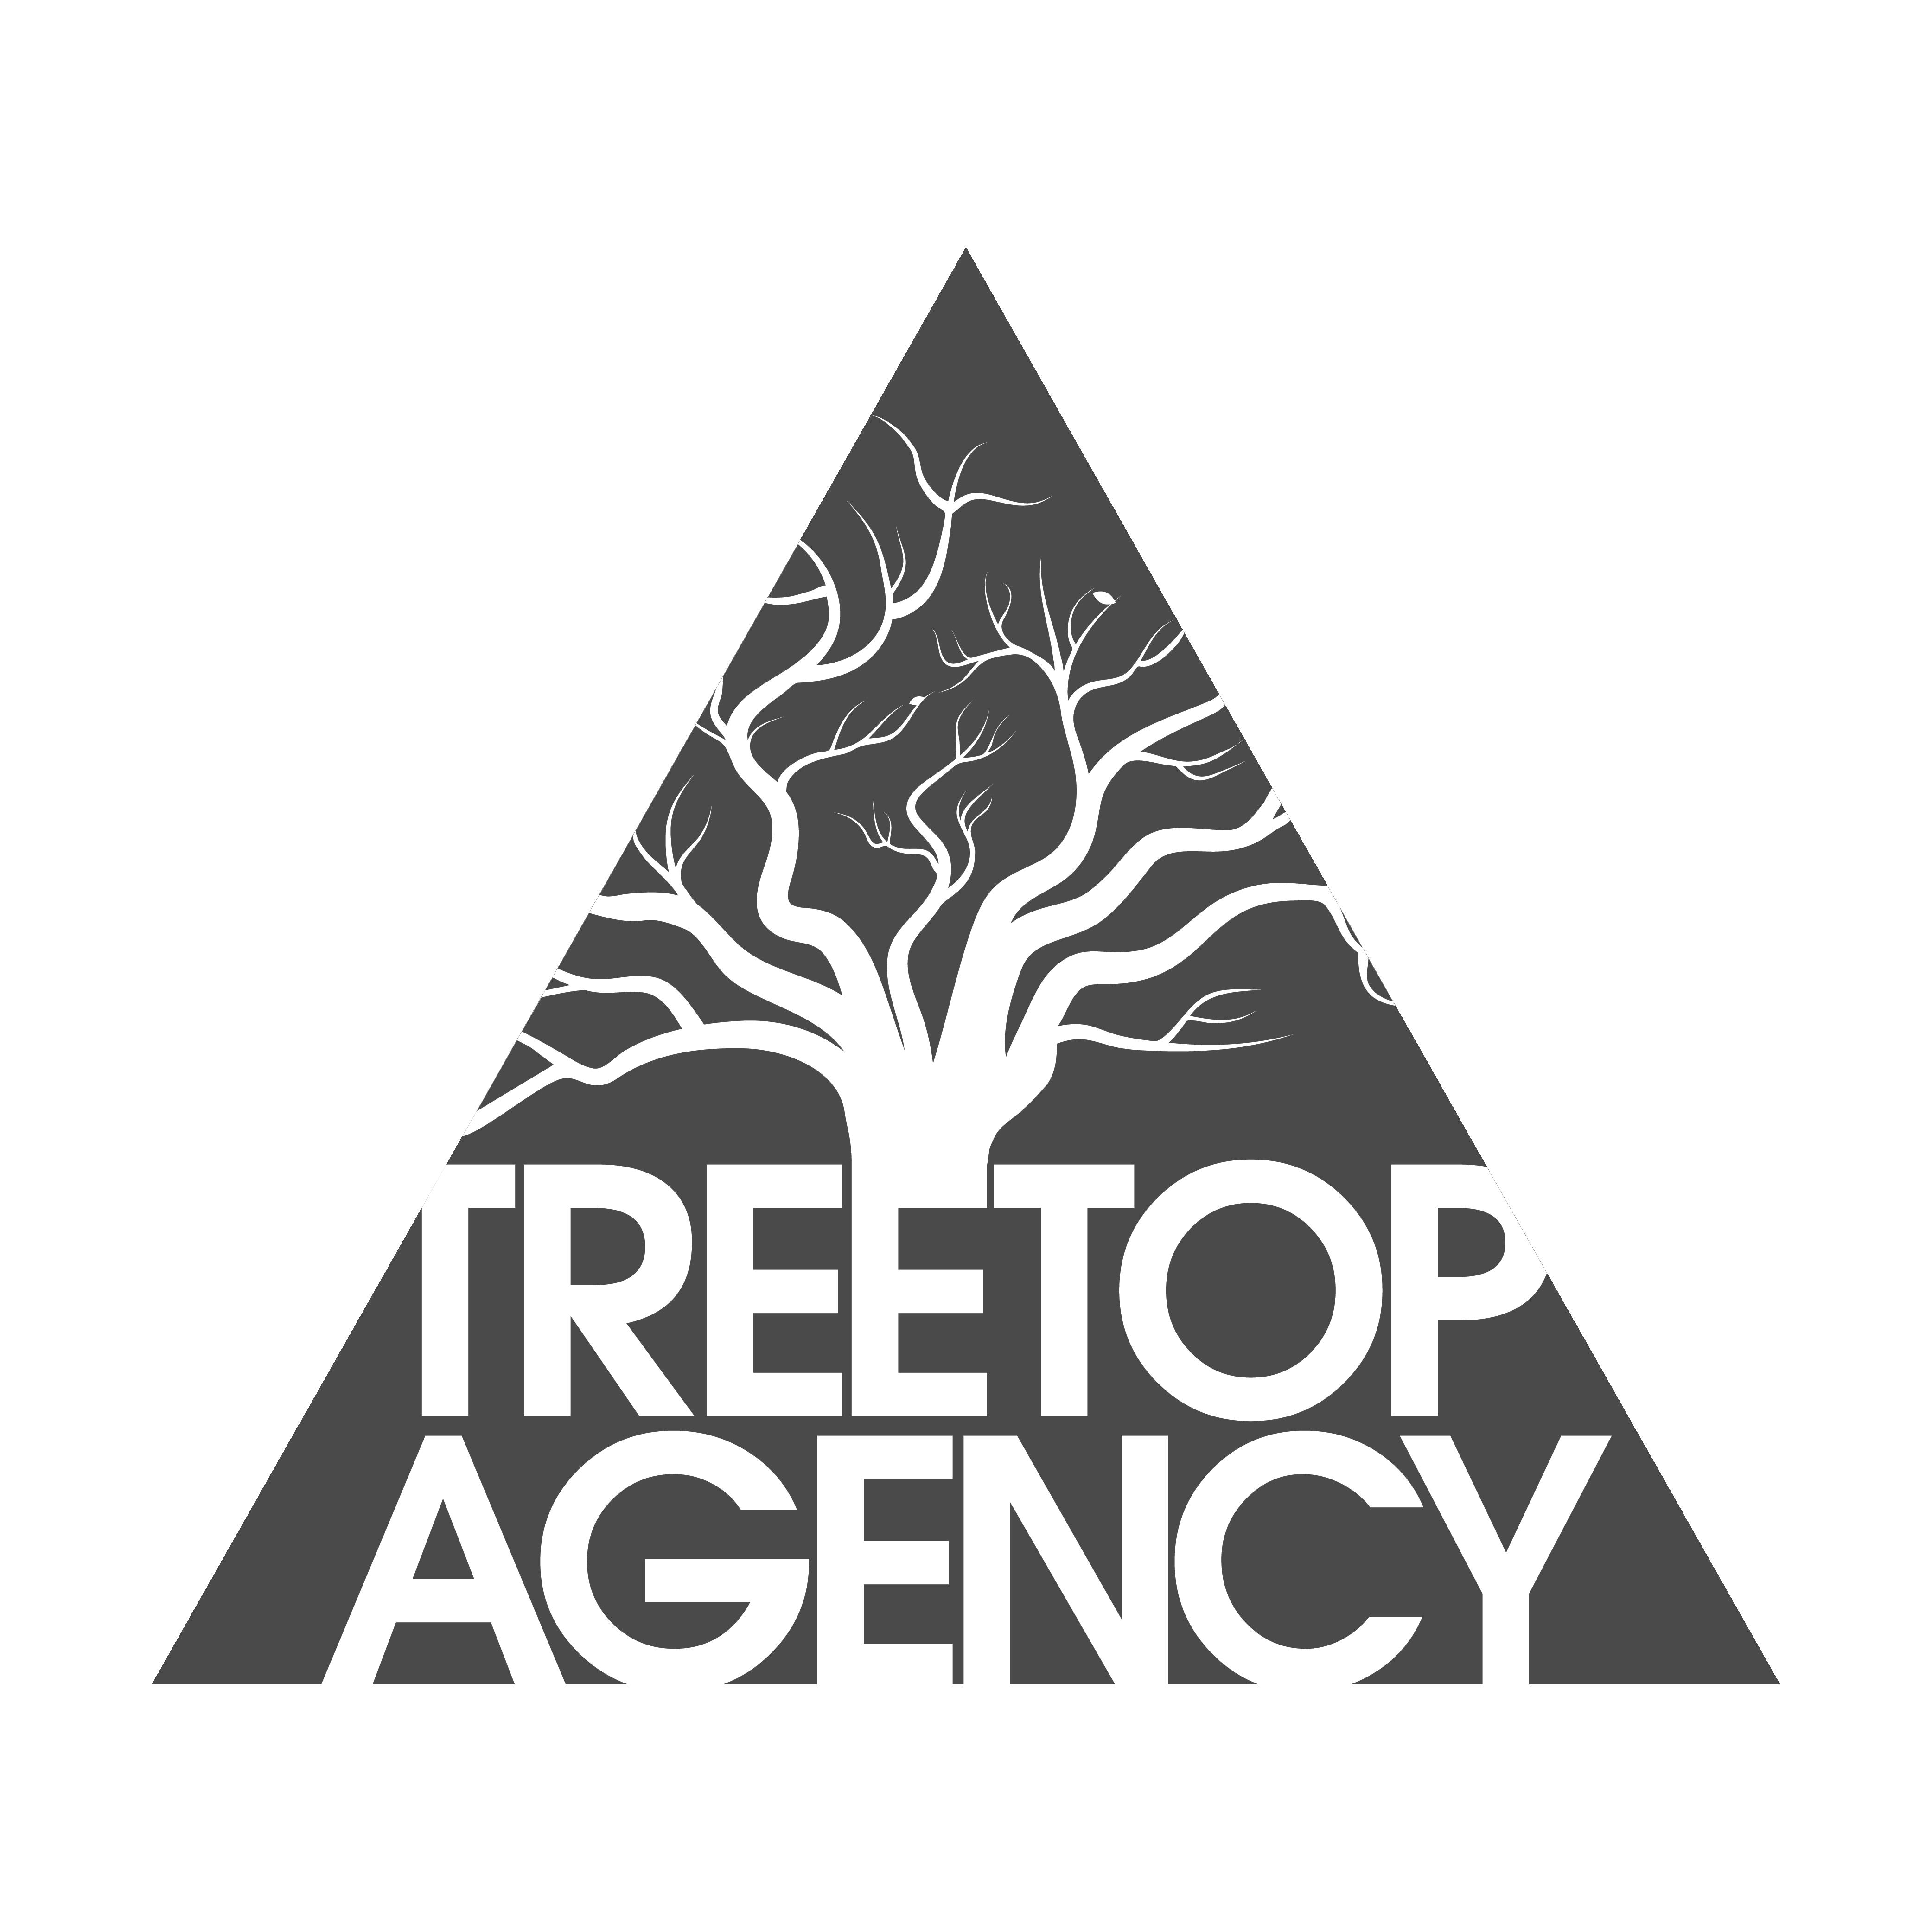 Treetop Agency